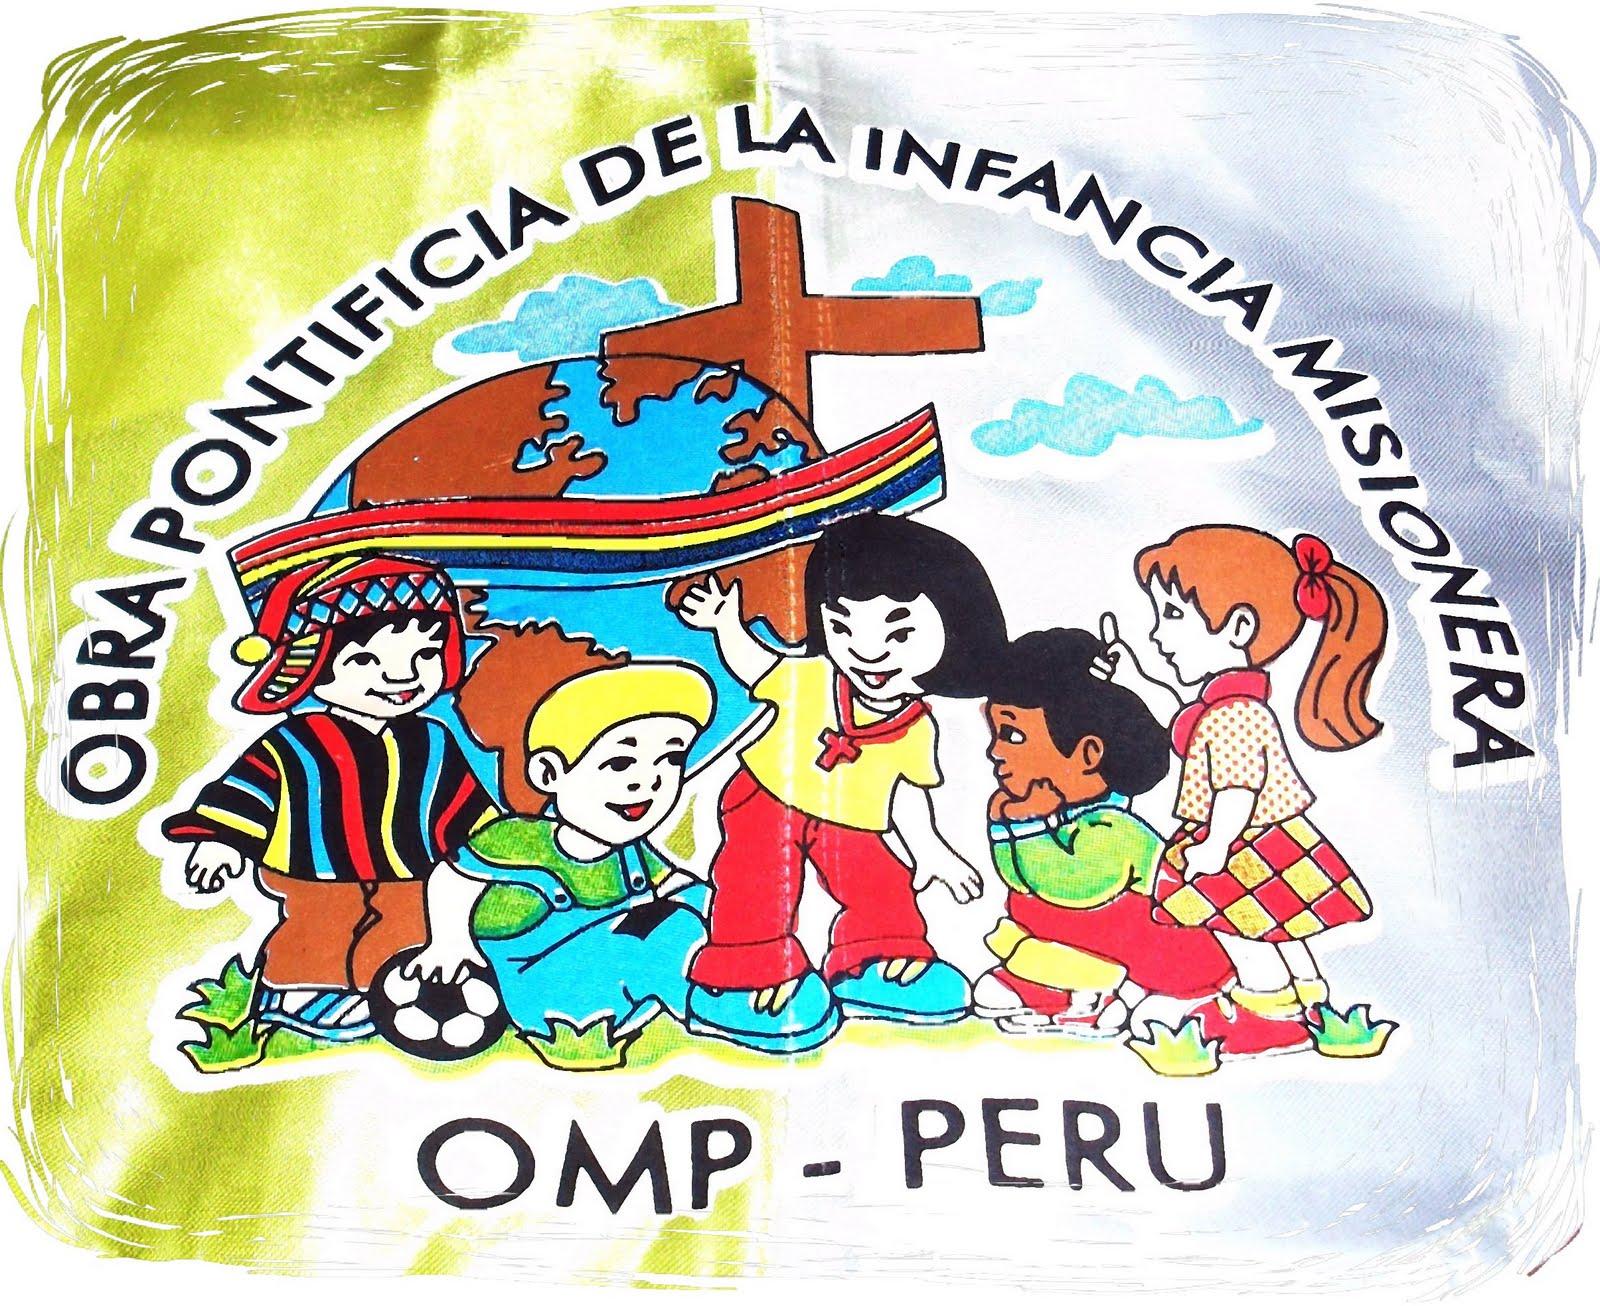 infancia misionera com: